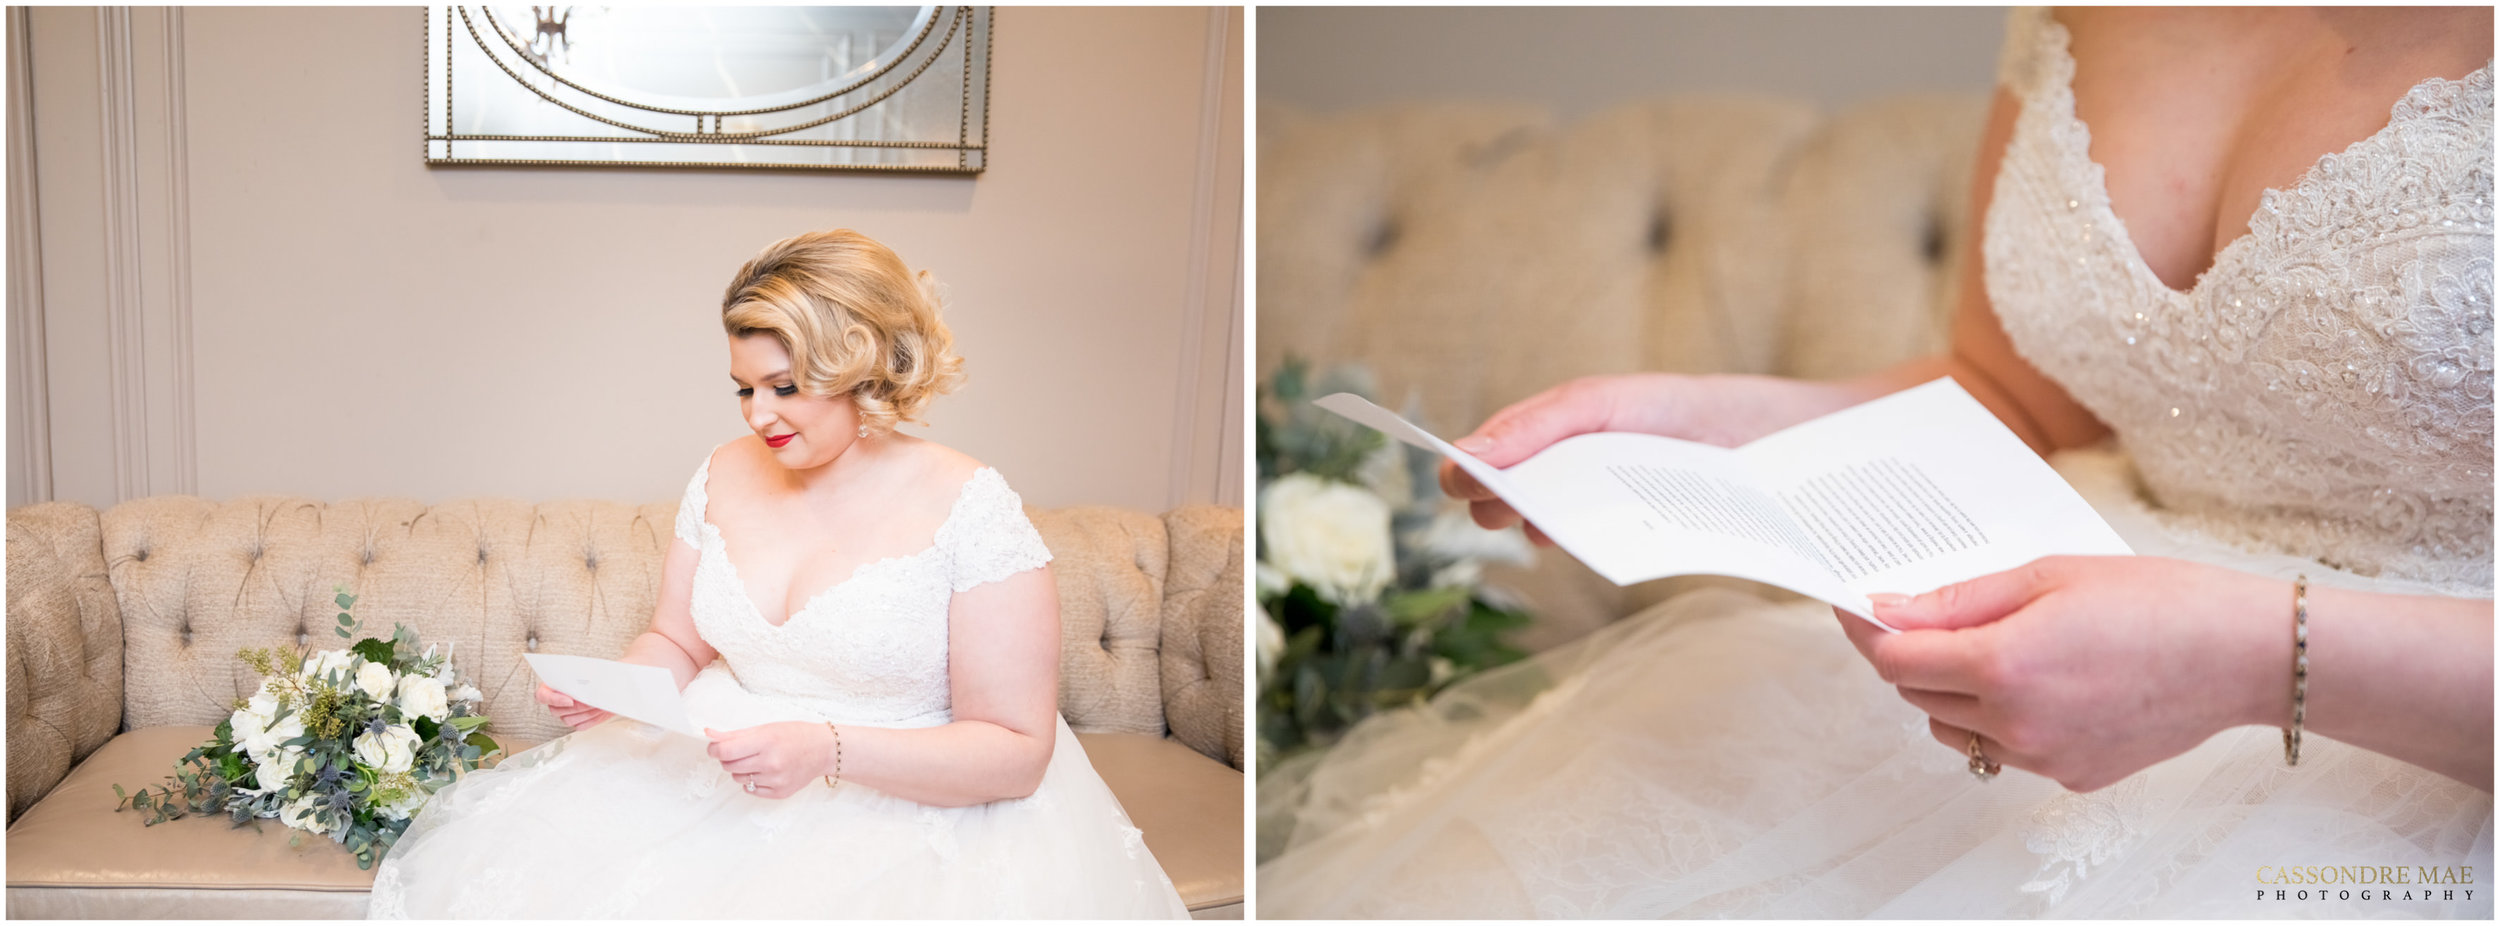 Cassondre Mae Photography Poughkeepsie NY Wedding 7.jpg